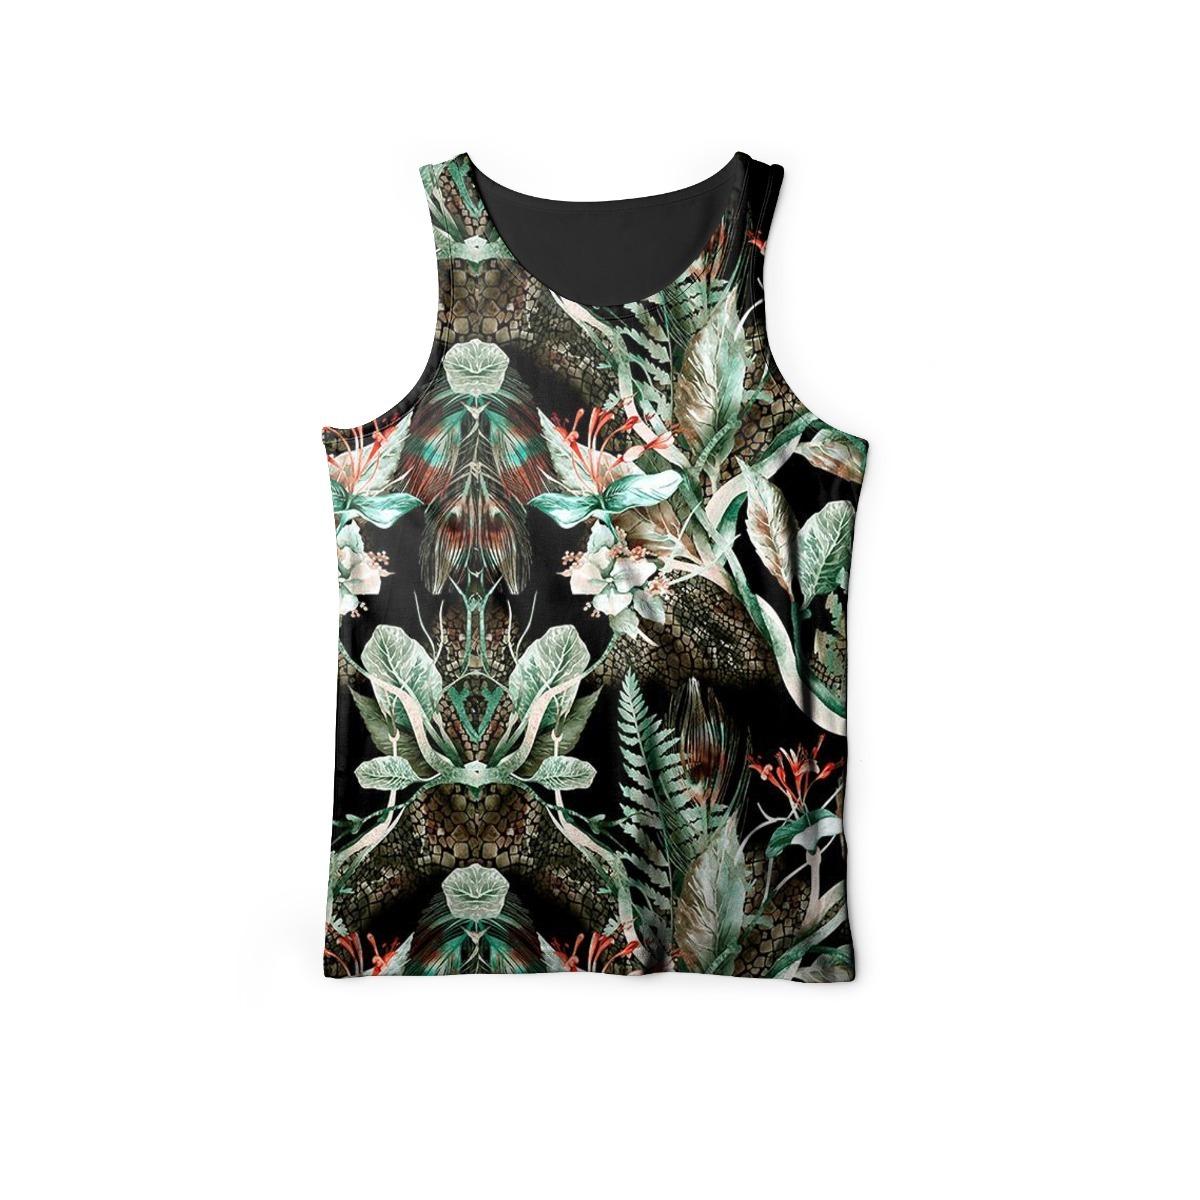 fe55d2327b camiseta regata masculina floral tropical verde estampada. Carregando zoom.